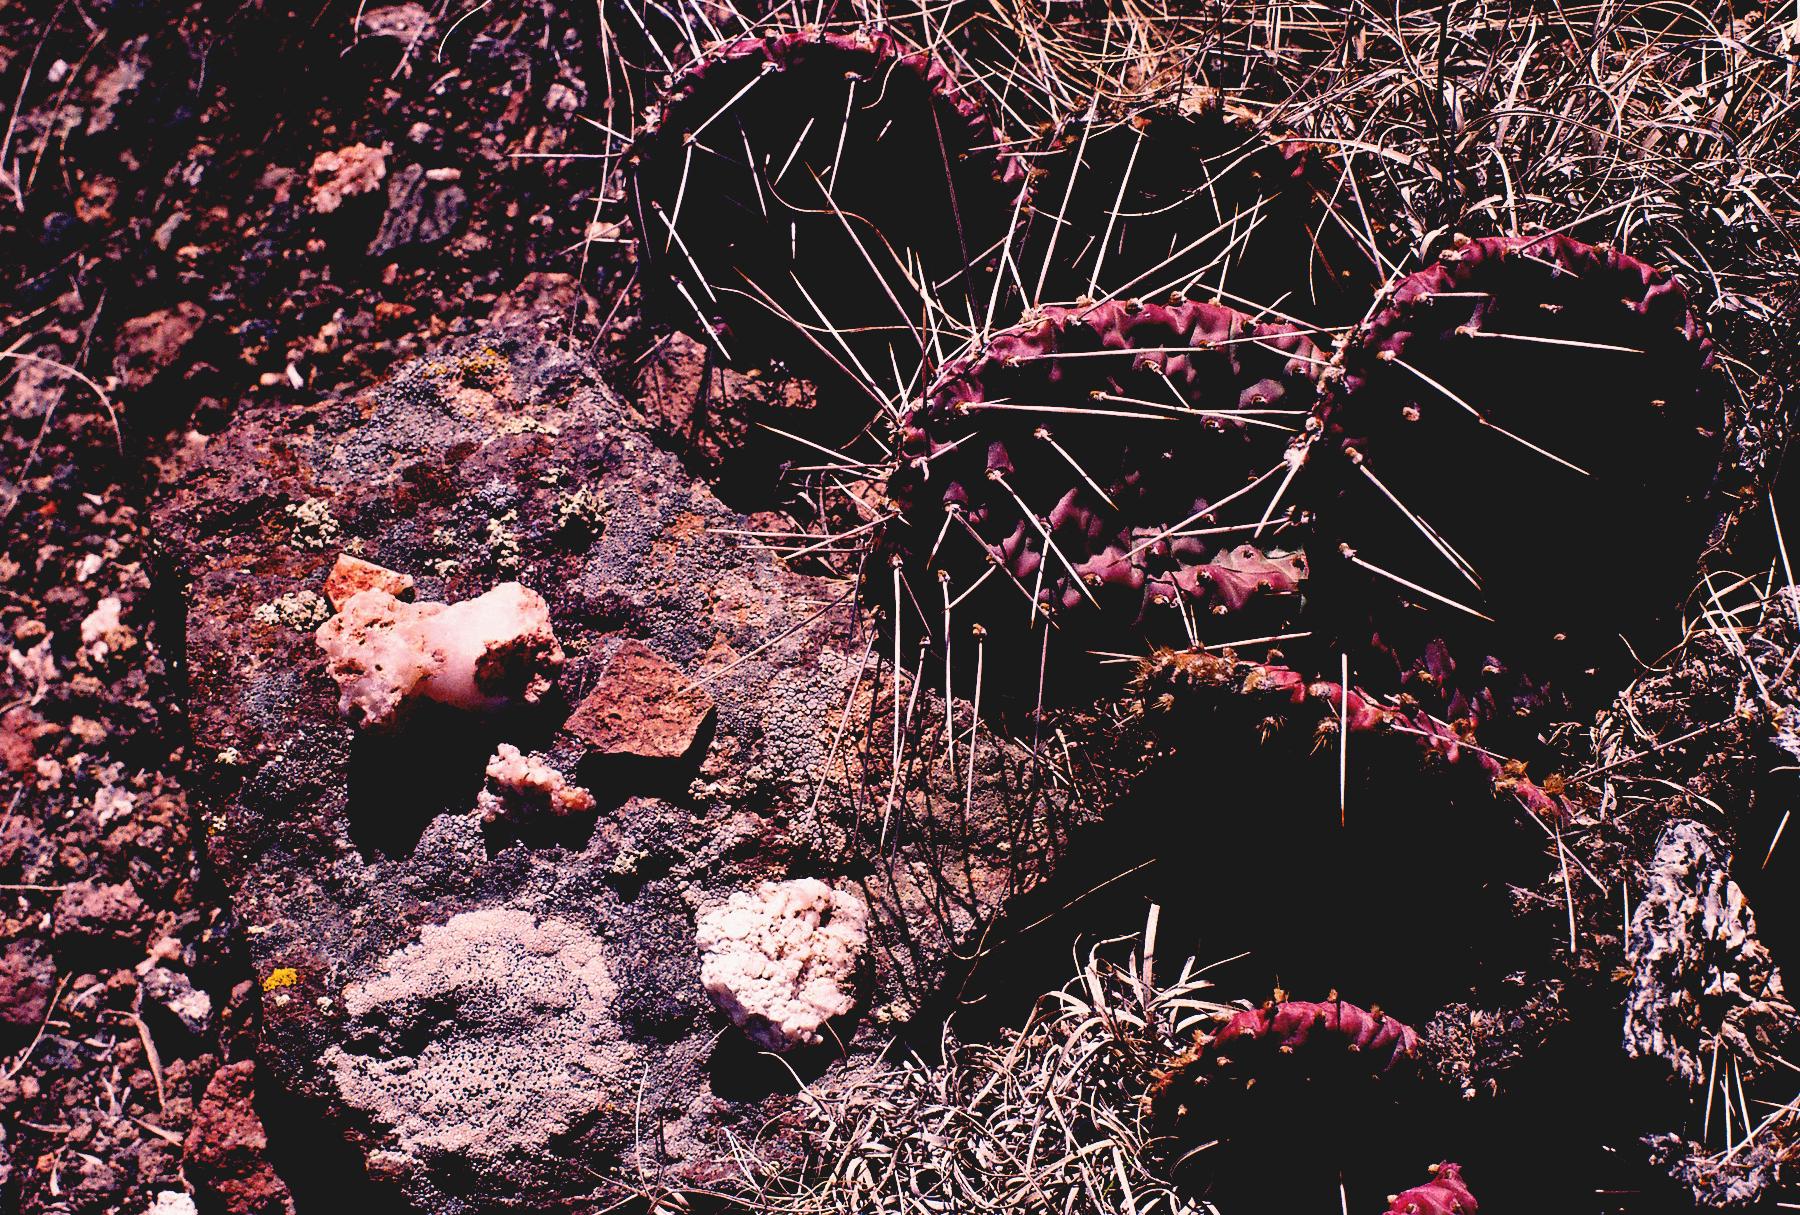 MintFresca-LunarNodes_Cacti.jpg